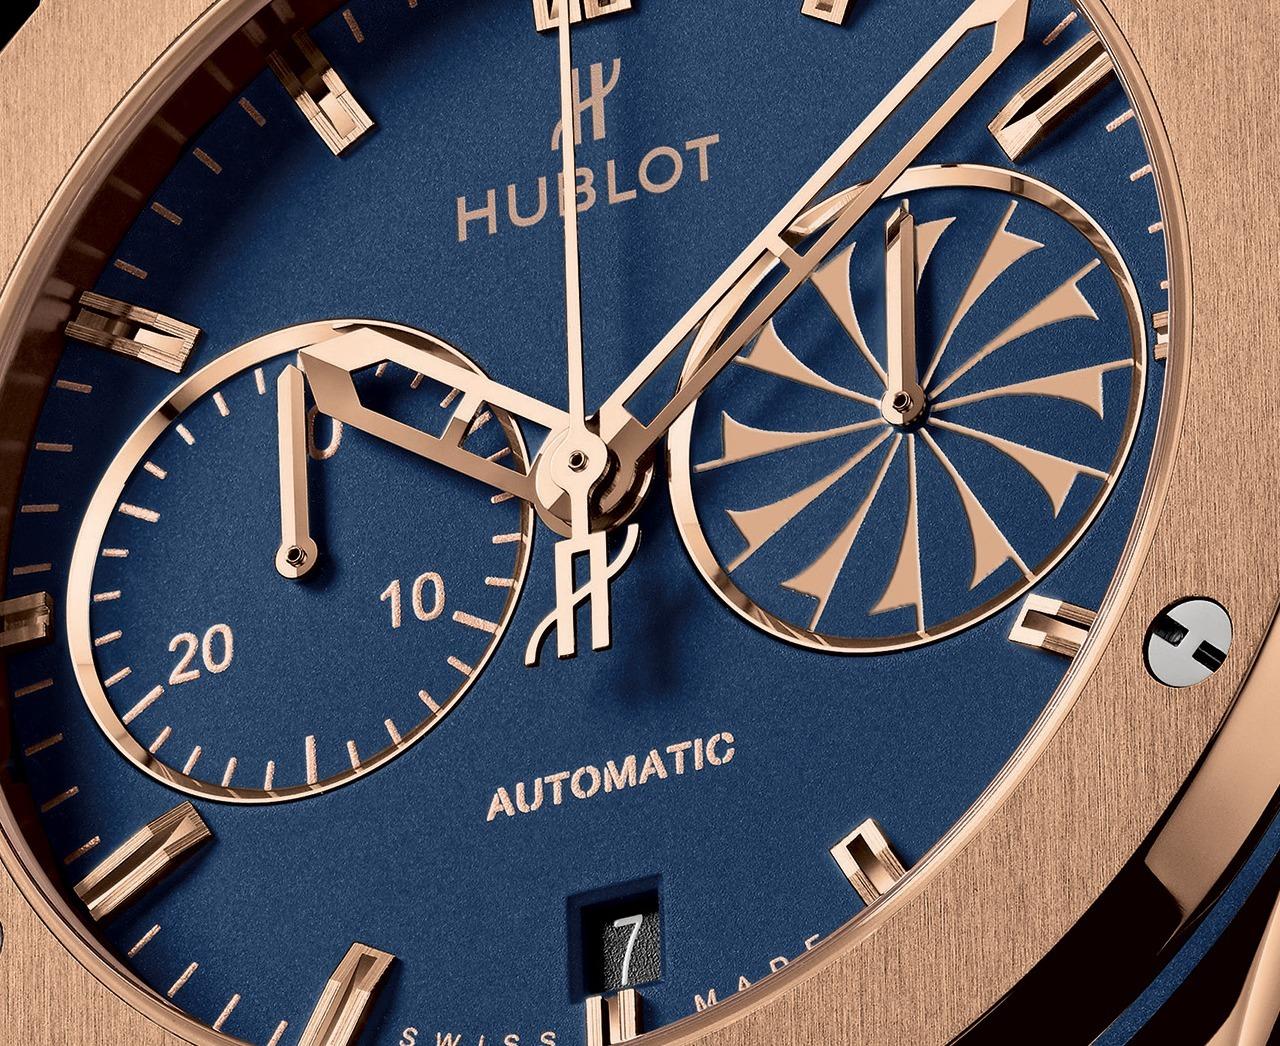 hublot-cronografo-classic-fusion-mykonos-2013_0-100_3